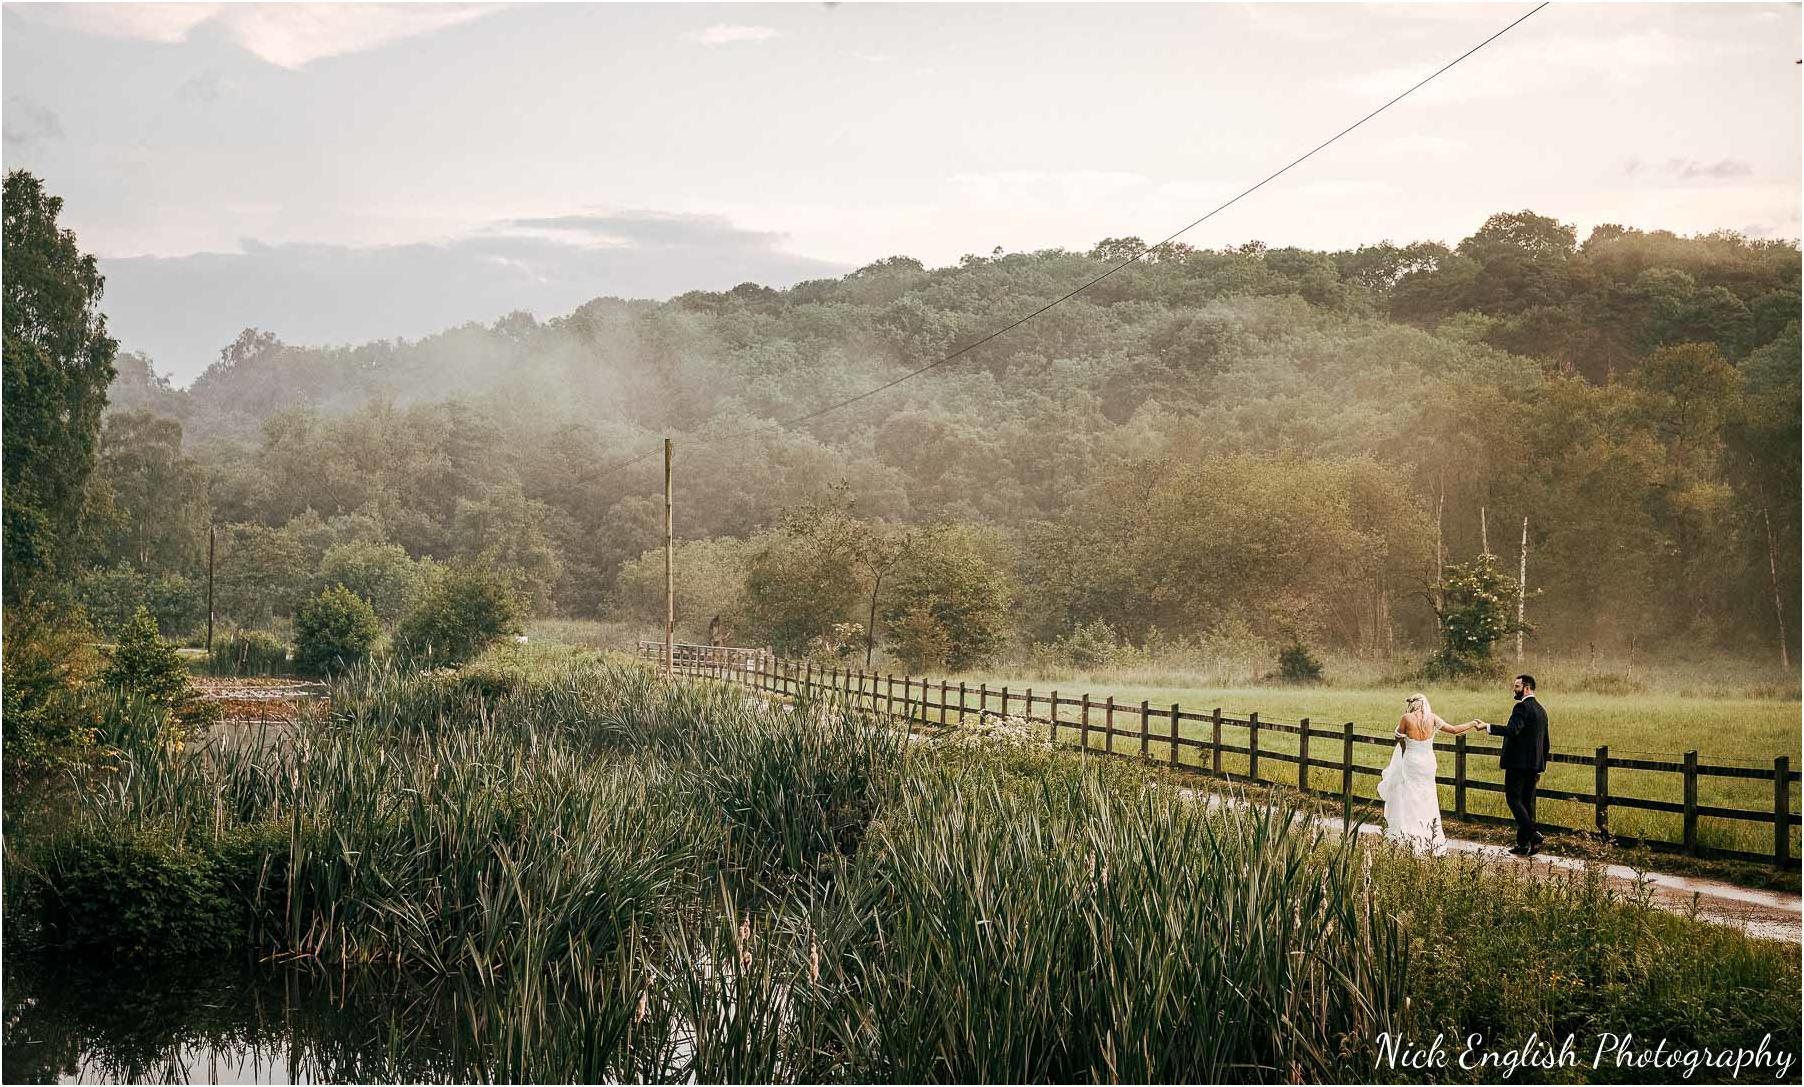 Whitebottom_Farm_Wedding_Manchester_Photograph-138.jpg